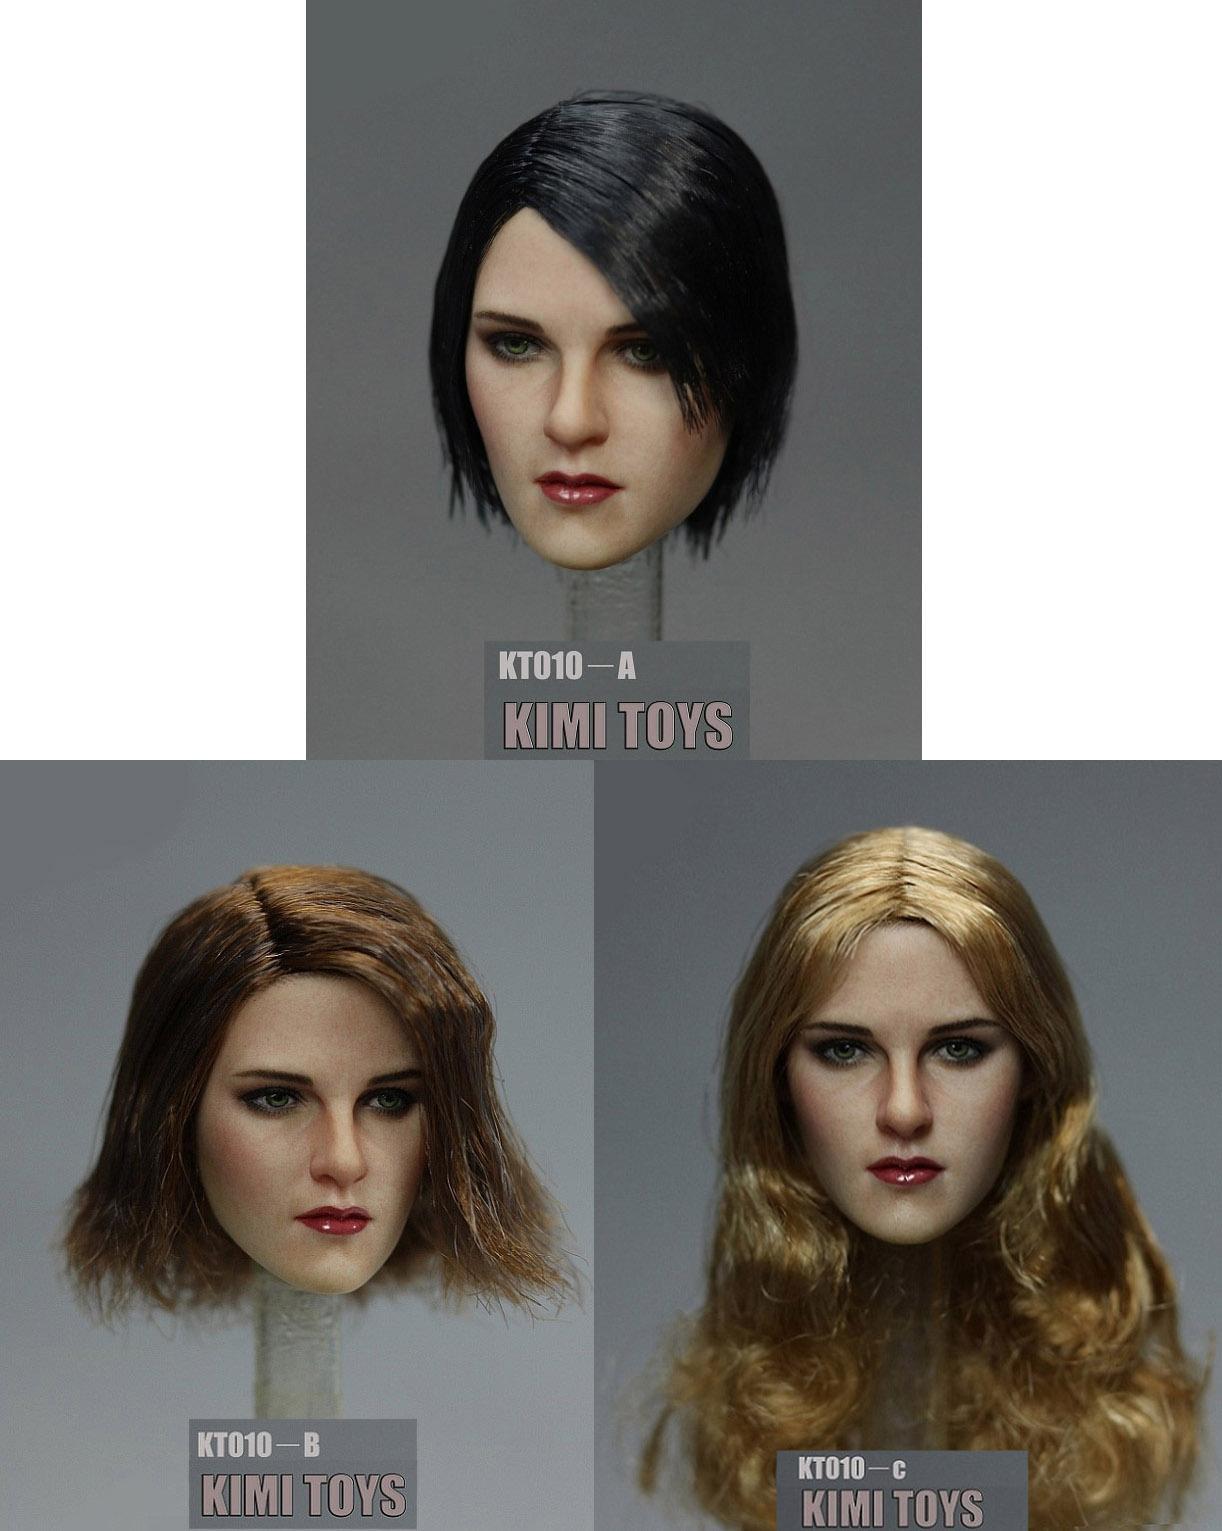 KIMI TOYS KT010 Europe Female headsculpt